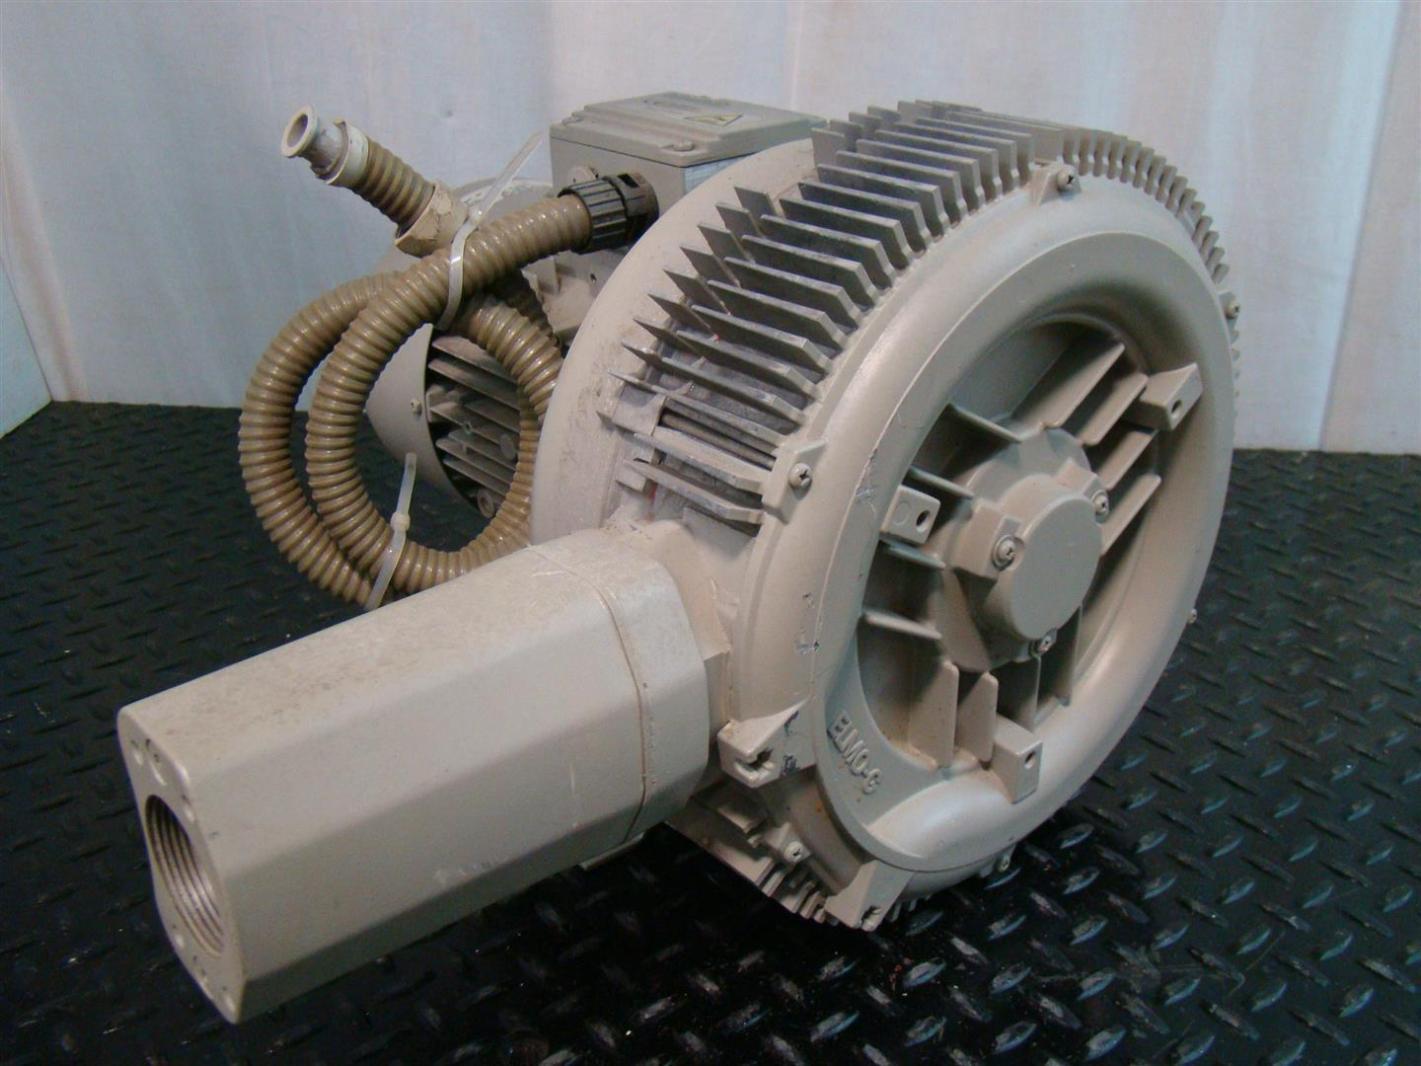 BBZ152HF eVendix 2 microfiltro HEPA H12 Adatto per Bosch Siemens |/Simile alloriginale BSG7 491669 |/qualit/à Premium VZ152HFB VS07G